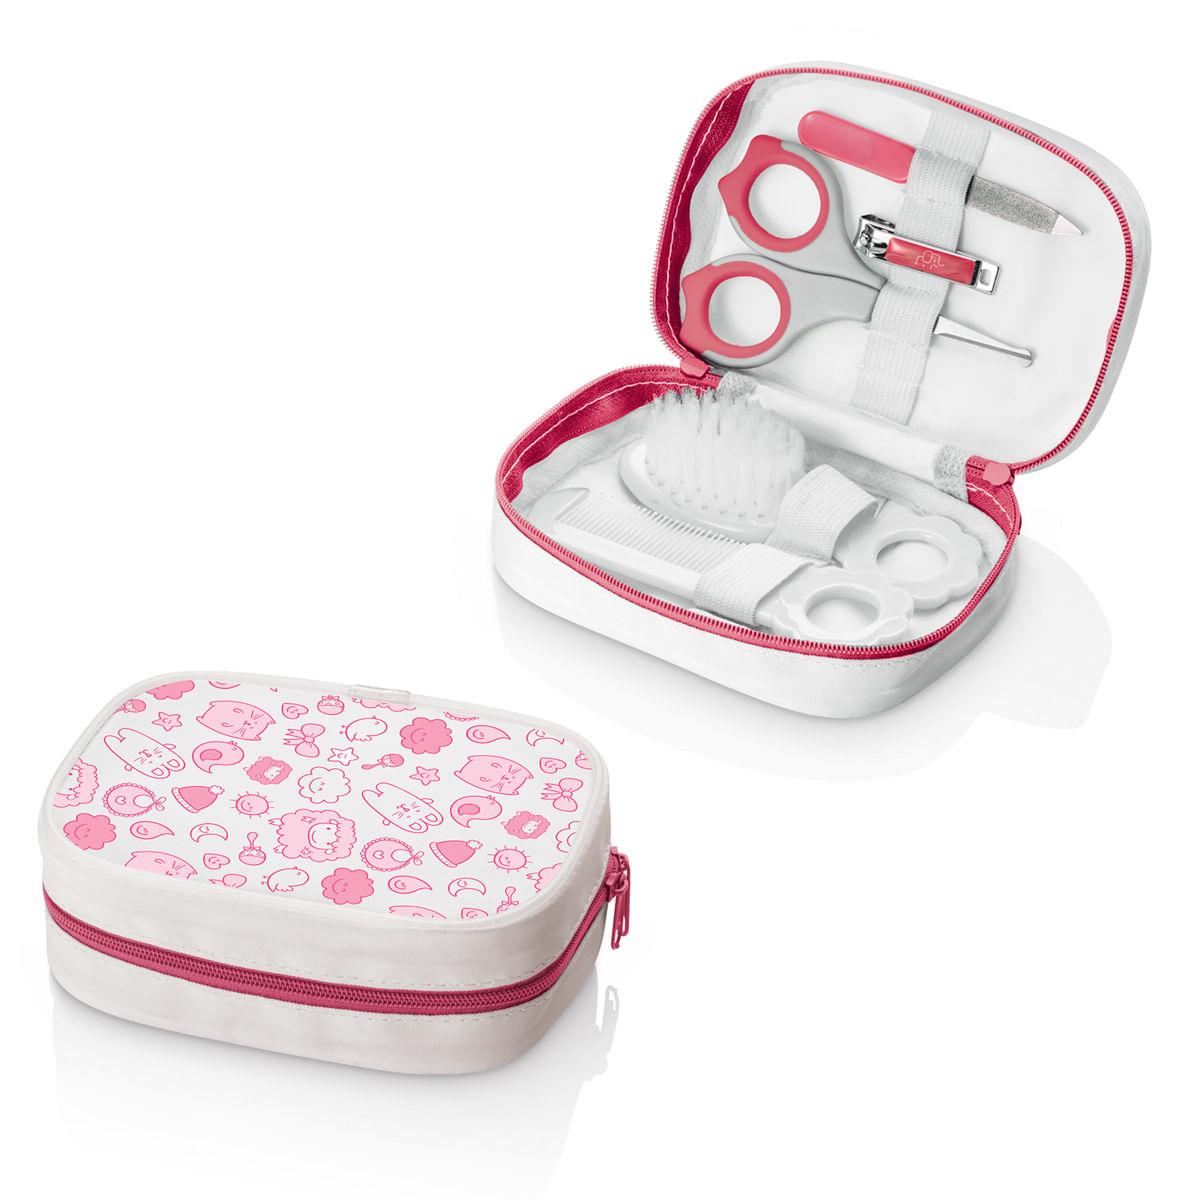 ac85bfd80b Kit Higiene Multikids Baby